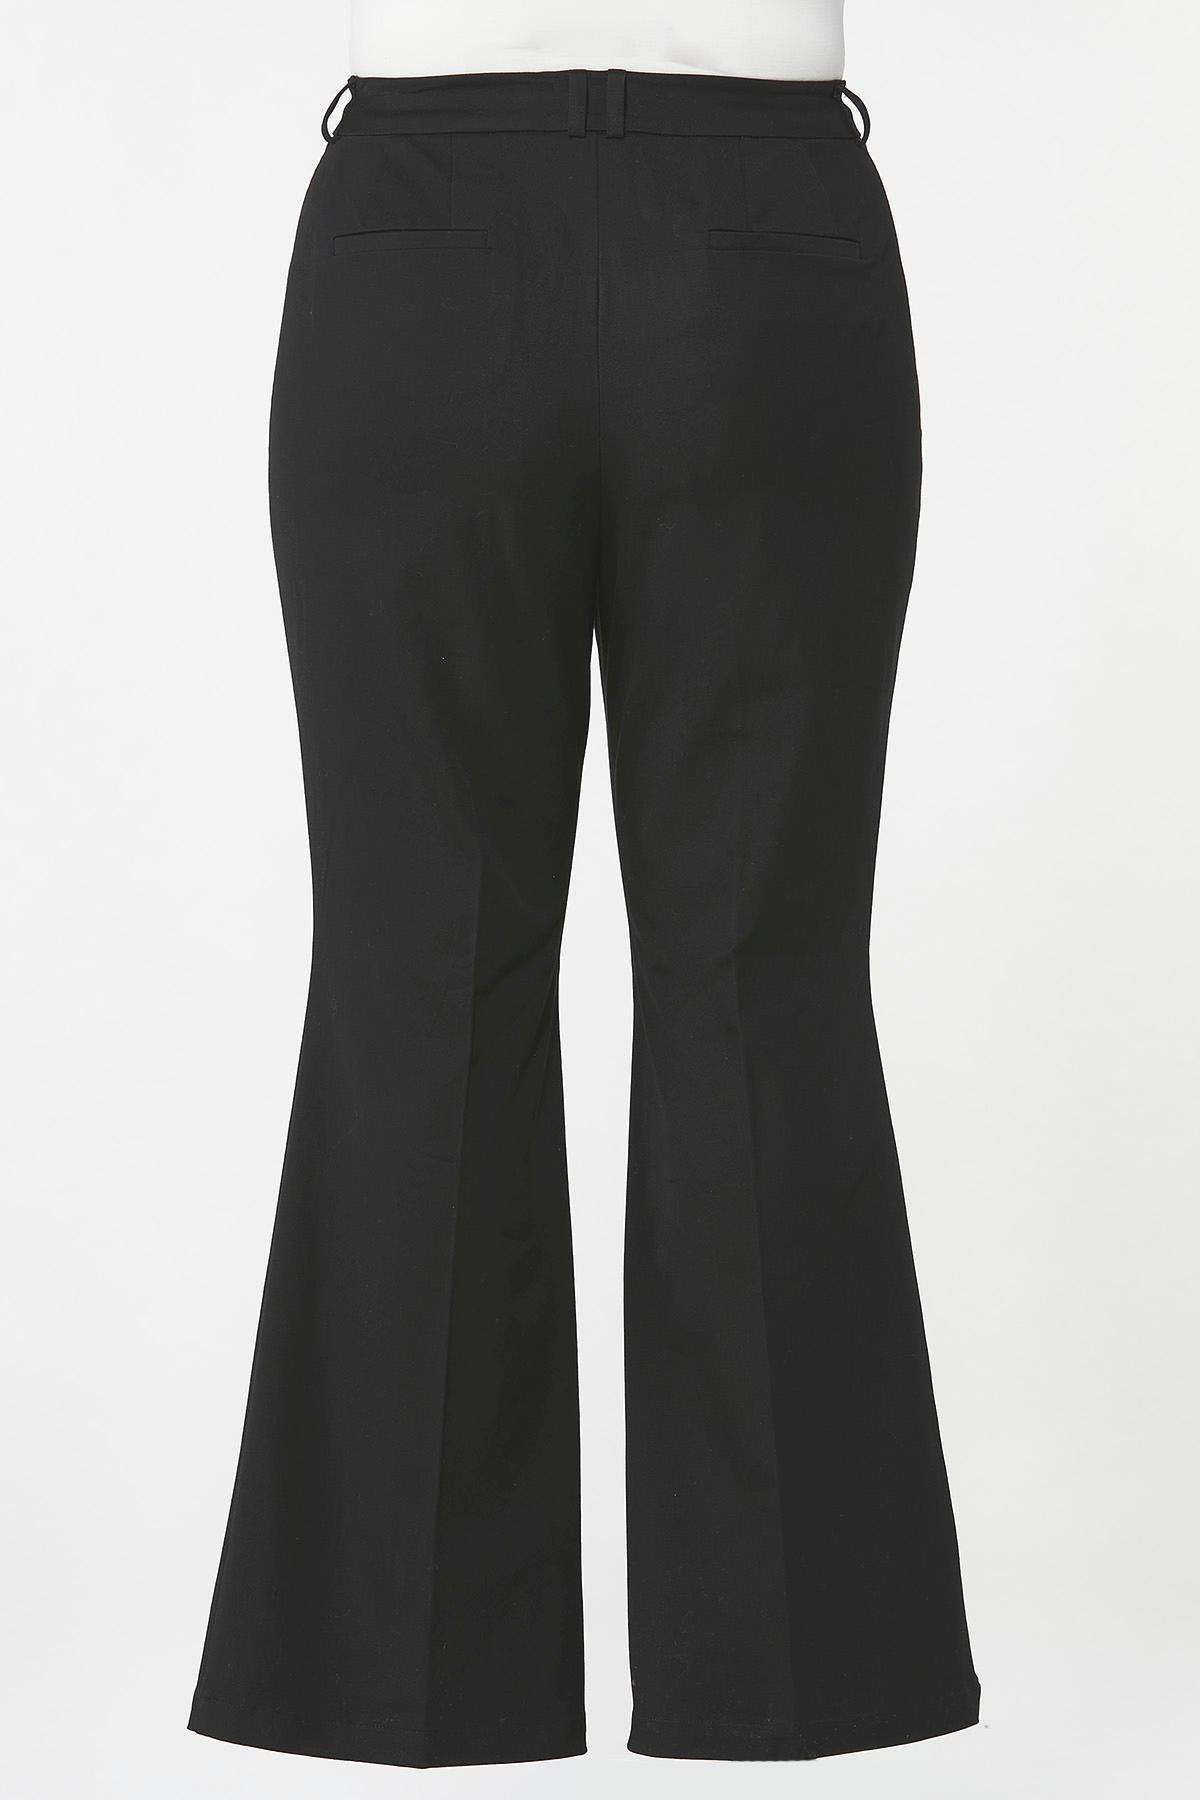 Plus Size Getaway Flare Leg Pants (Item #44658666)